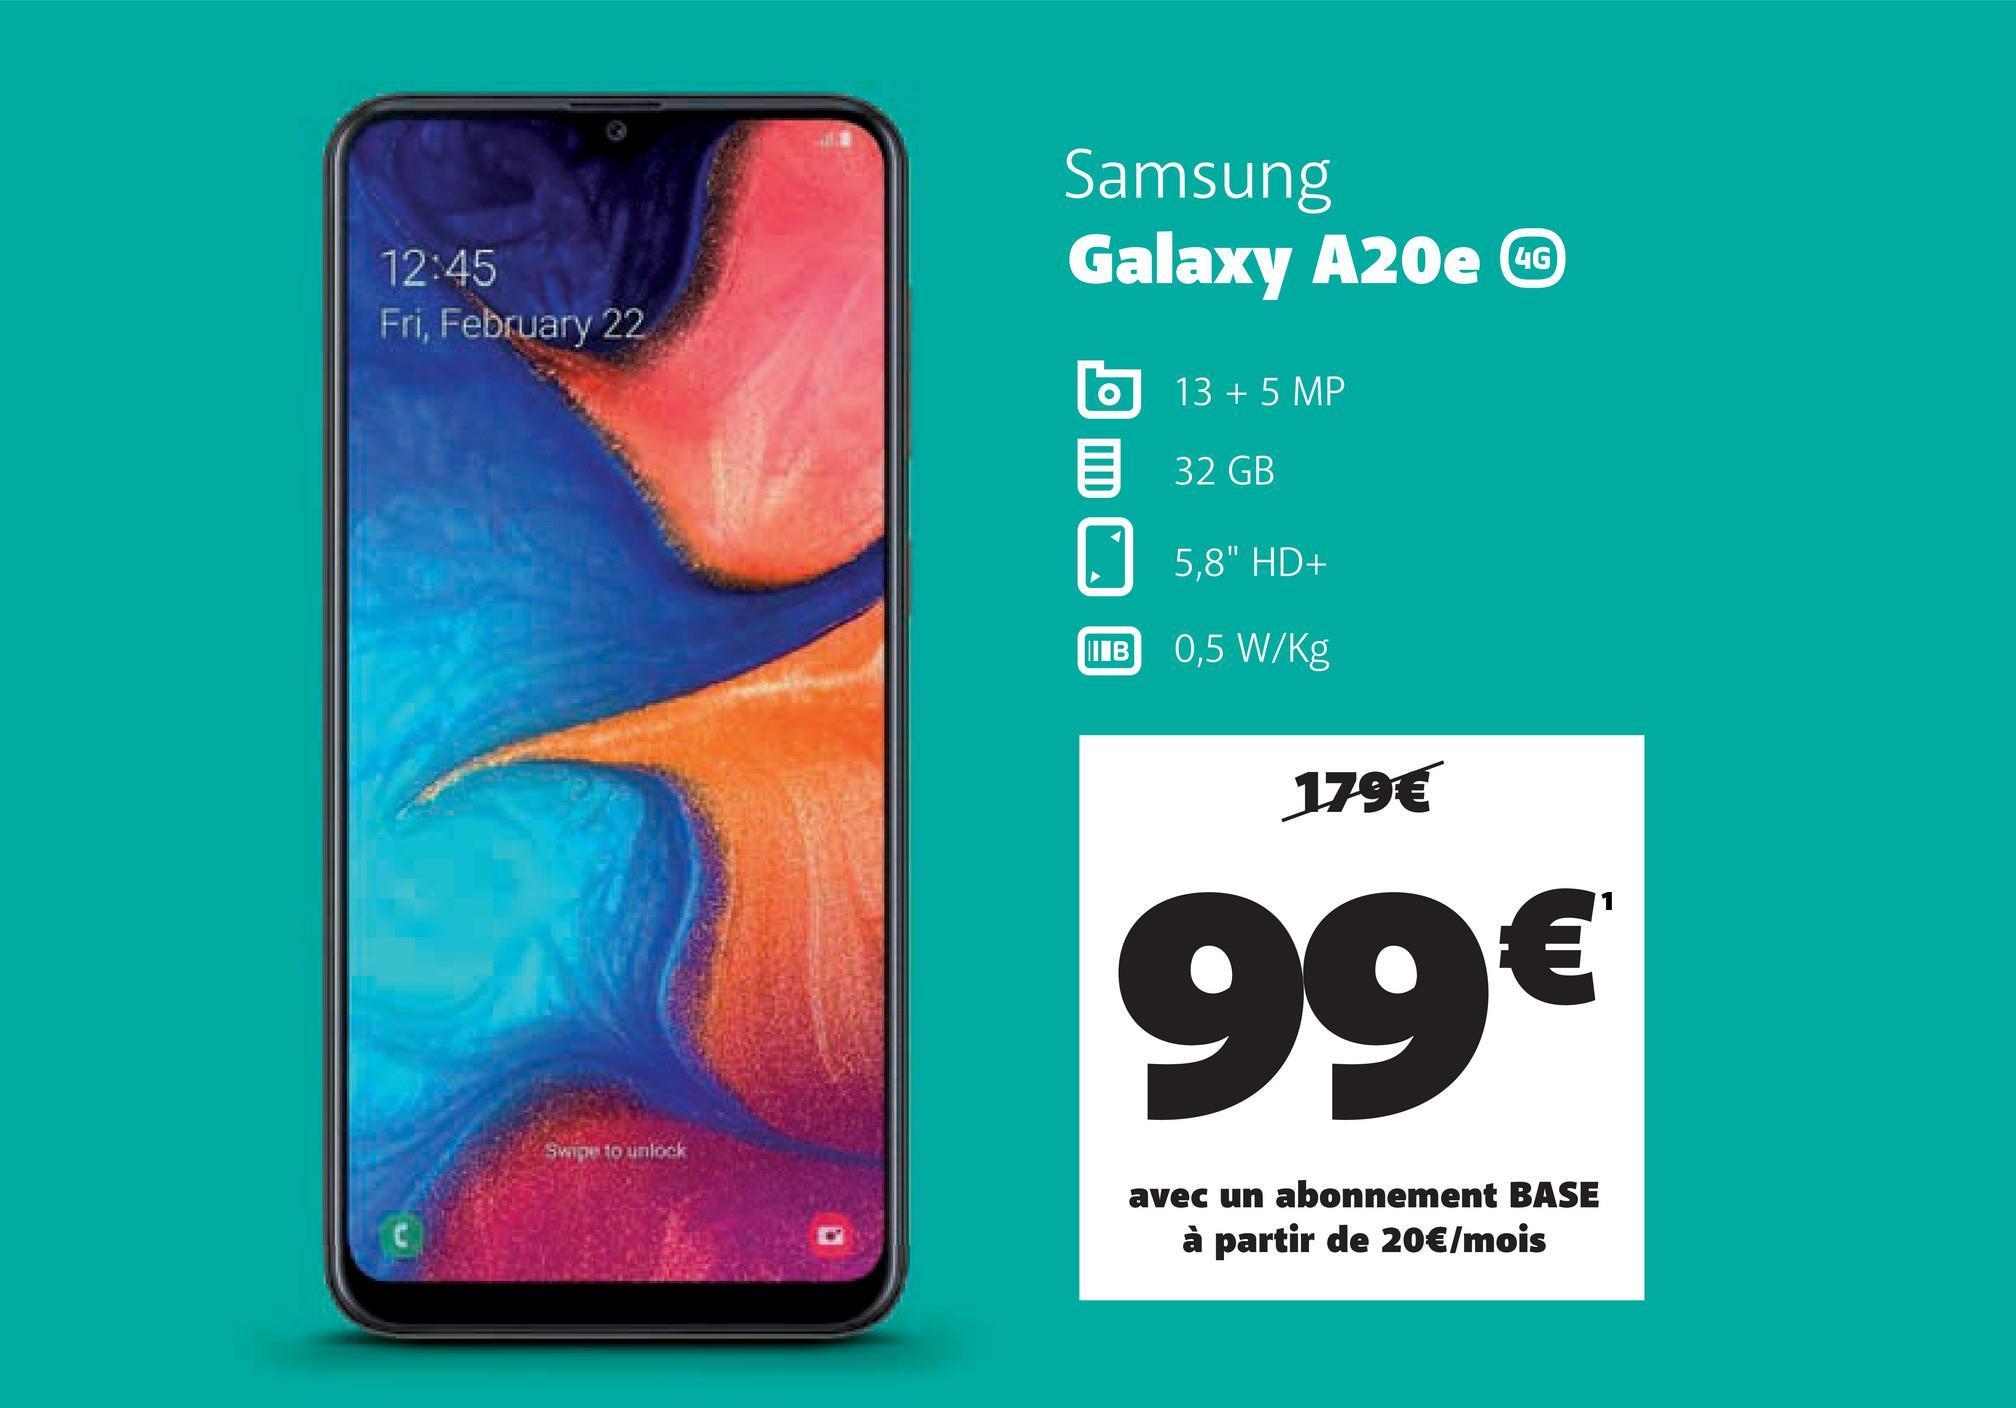 "4G 12:45 Fri, February 22 Samsung Galaxy A20e b 13 + 5 MP 32 GB 15,8"" HD+ IB 0,5 W/kg 179€ 99€ Sape to unlock avec un abonnement BASE à partir de 20€/mois"